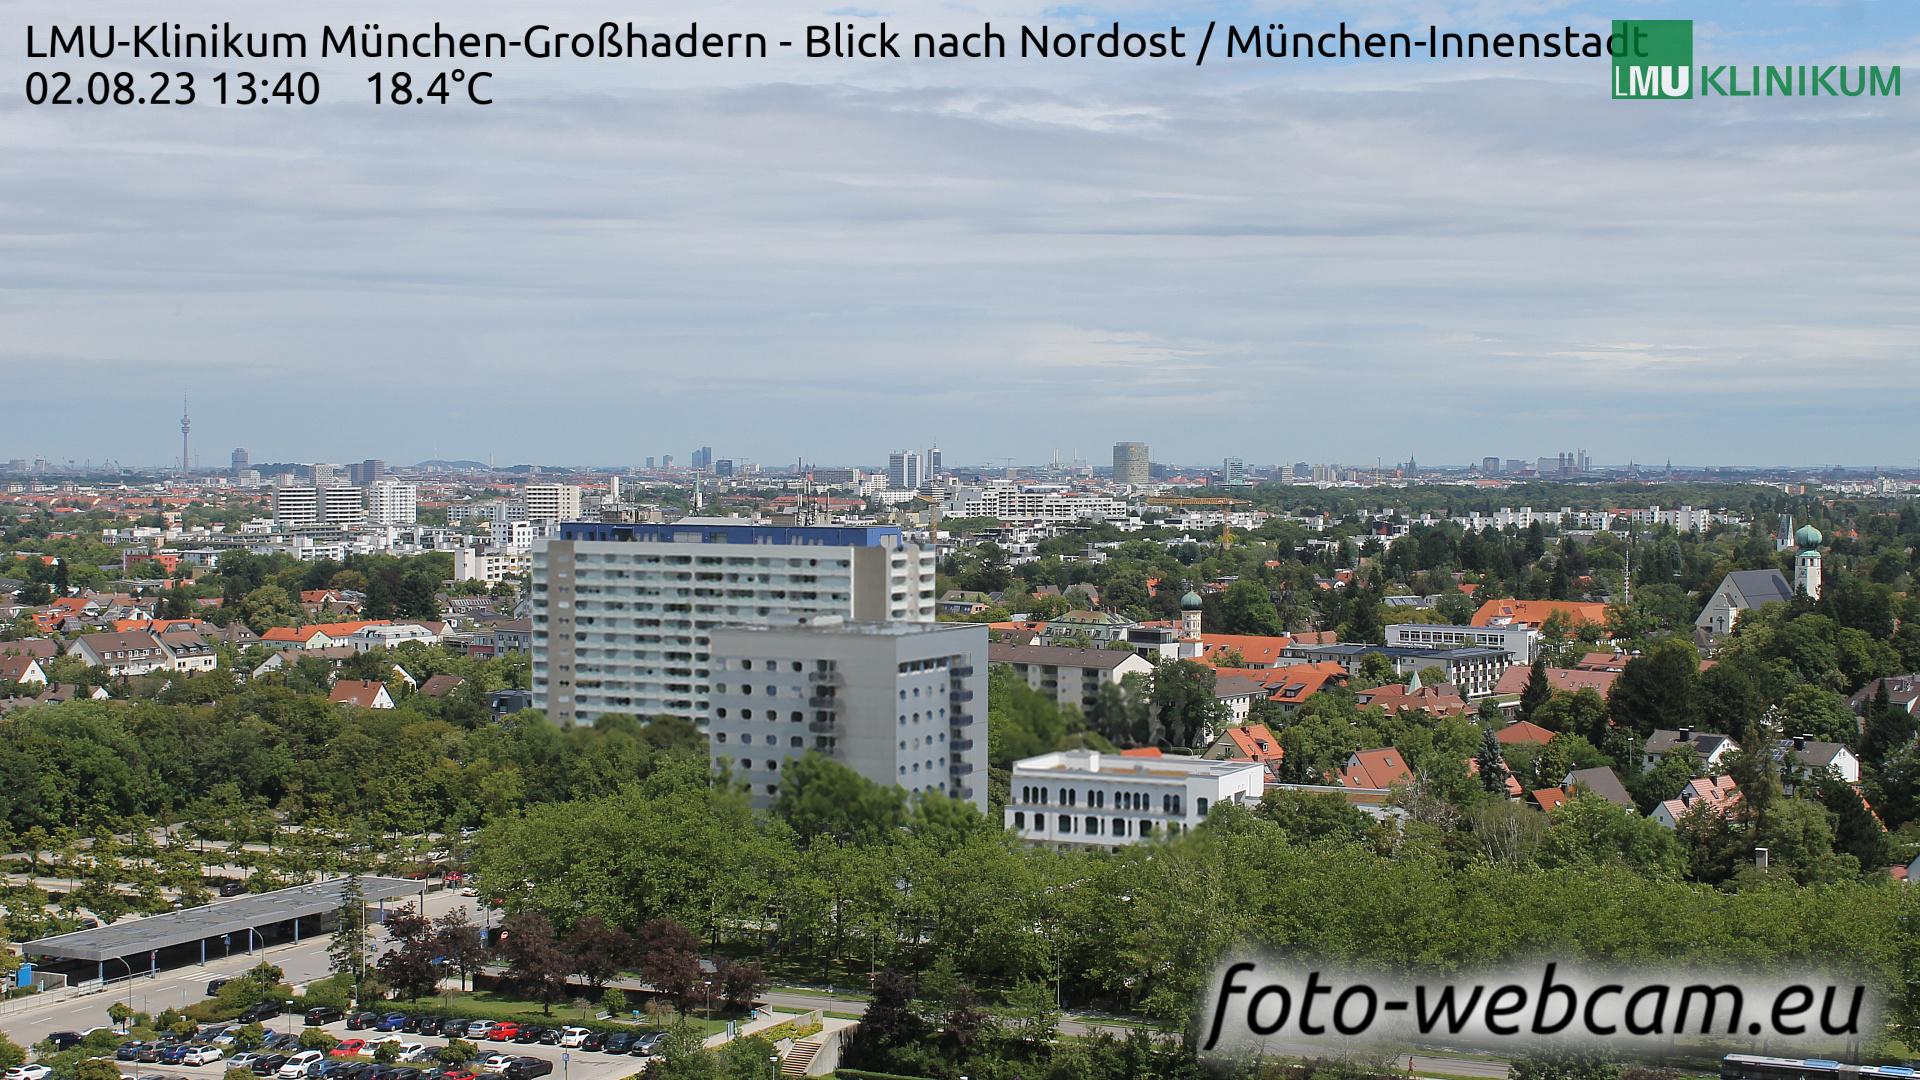 Munich Mon. 13:47